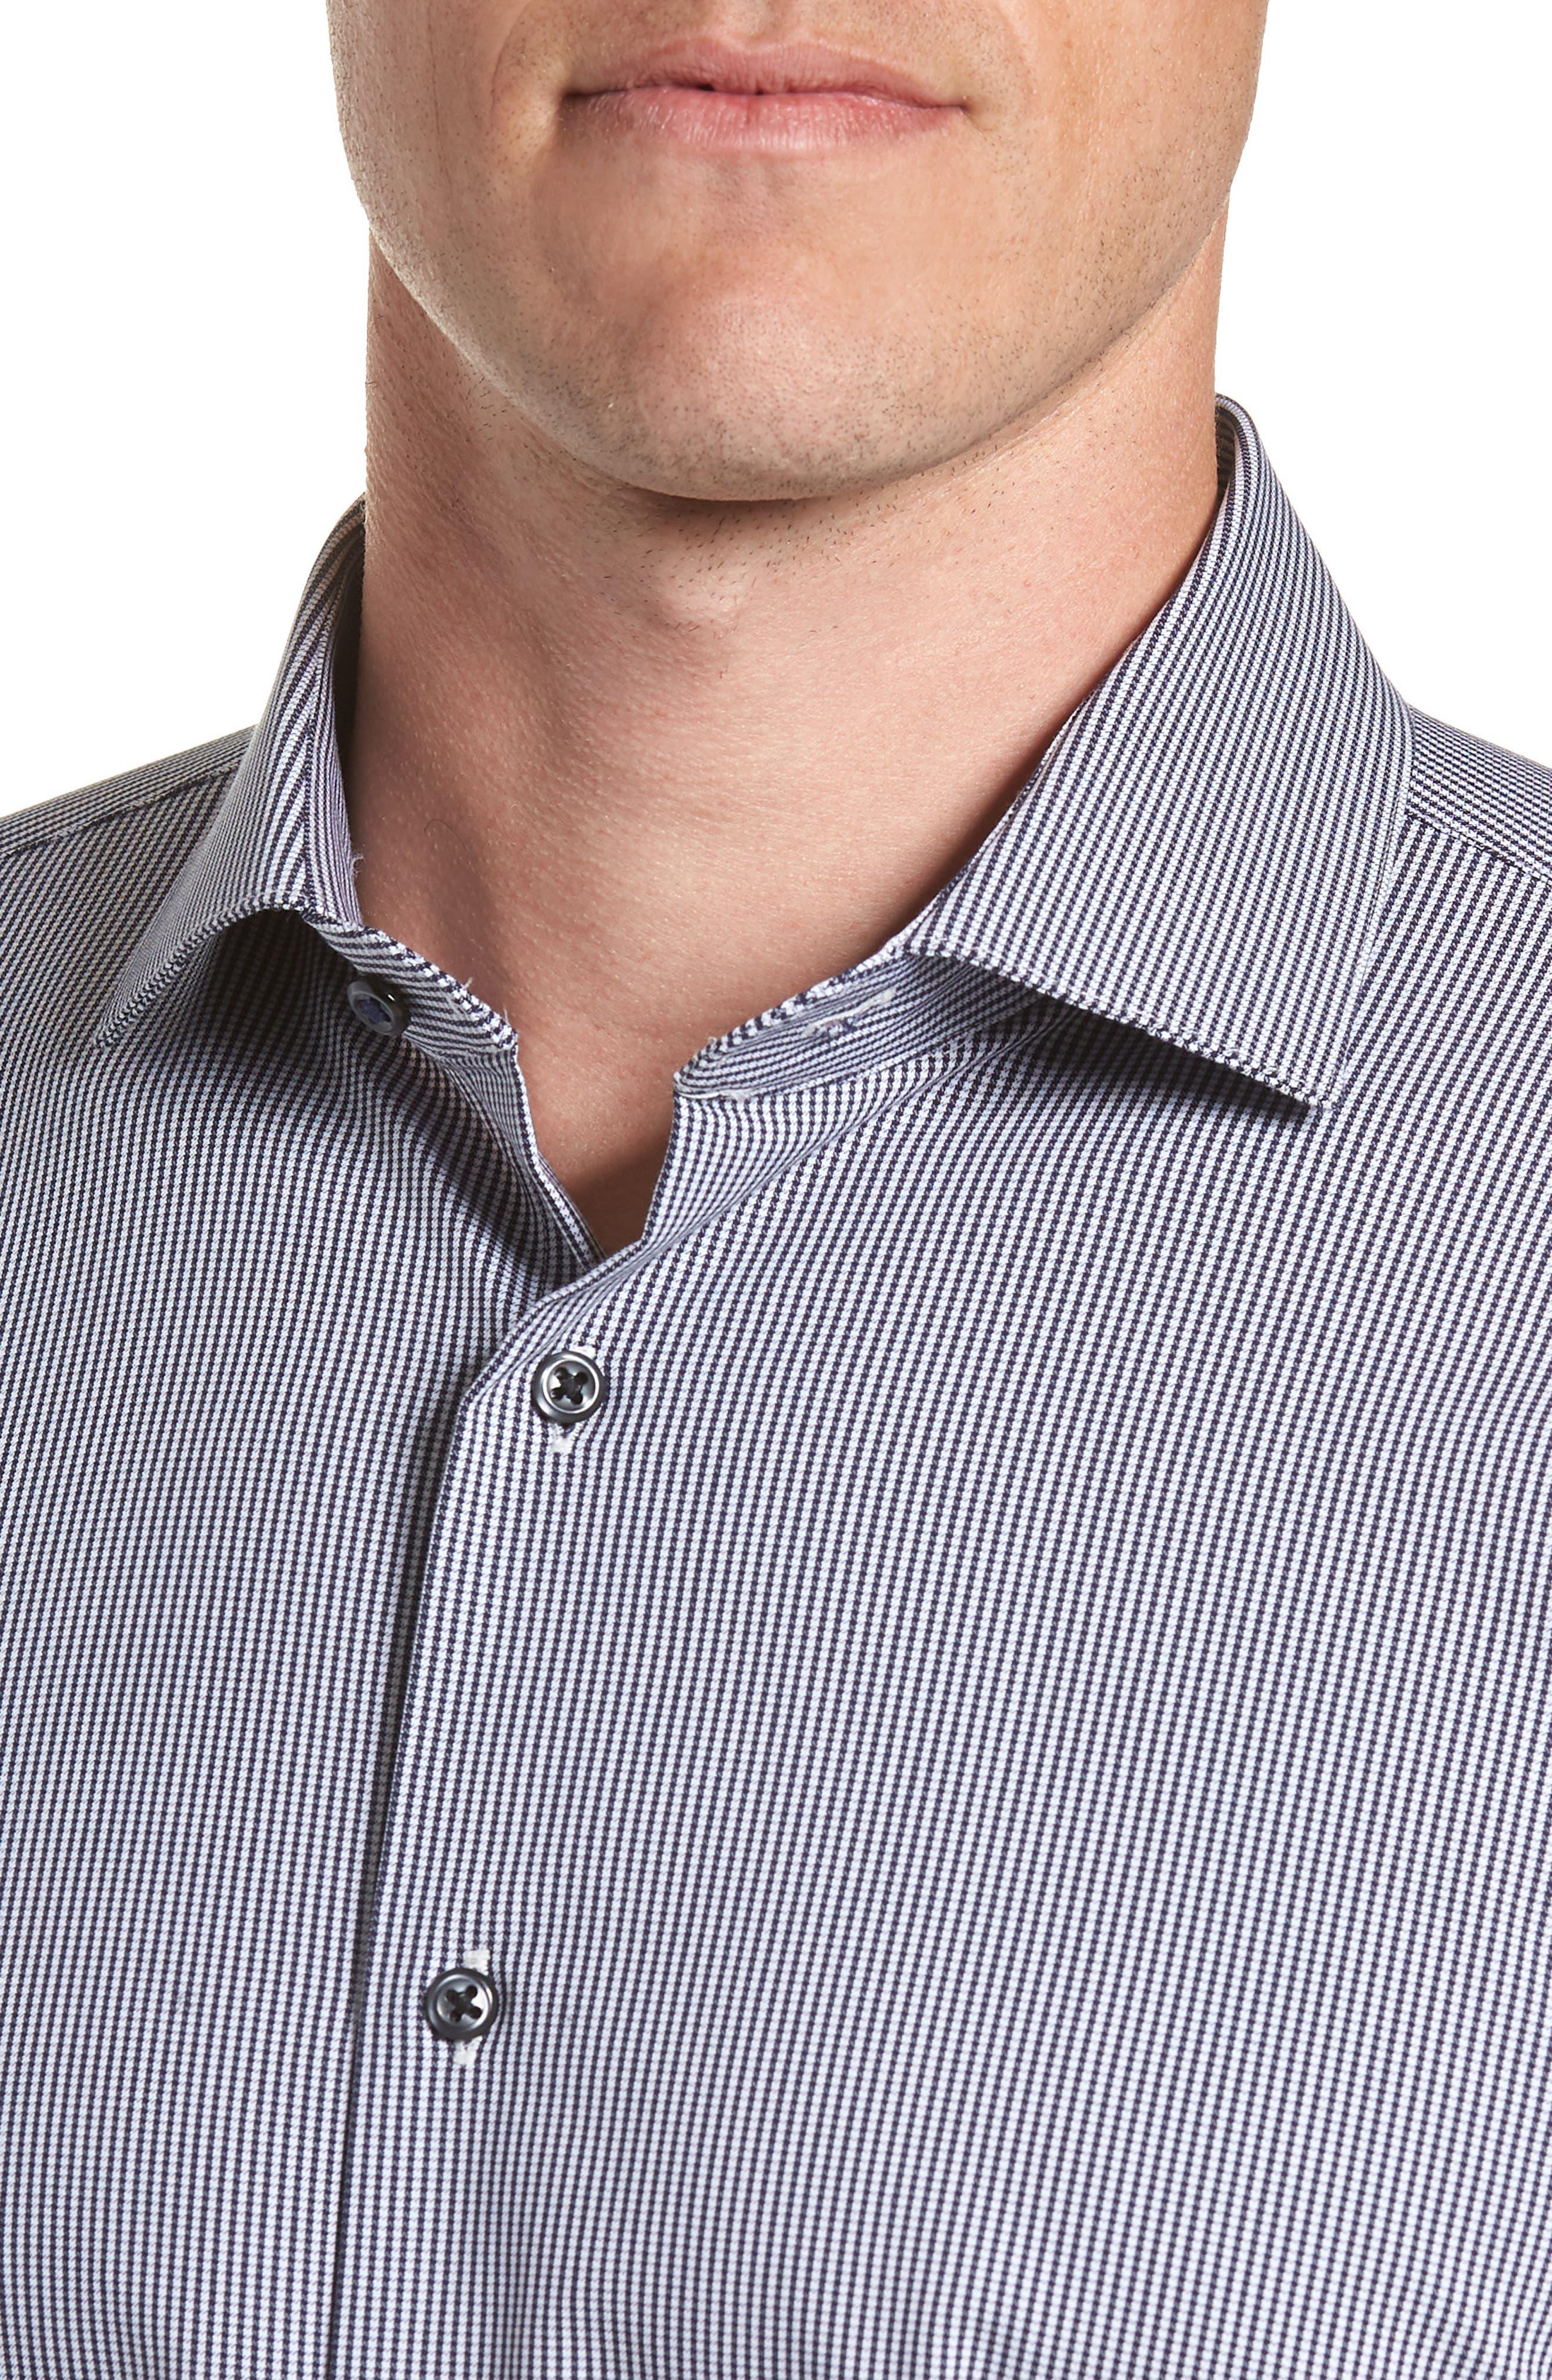 Tech-Smart Trim Fit Houndstooth Dress Shirt,                             Alternate thumbnail 3, color,